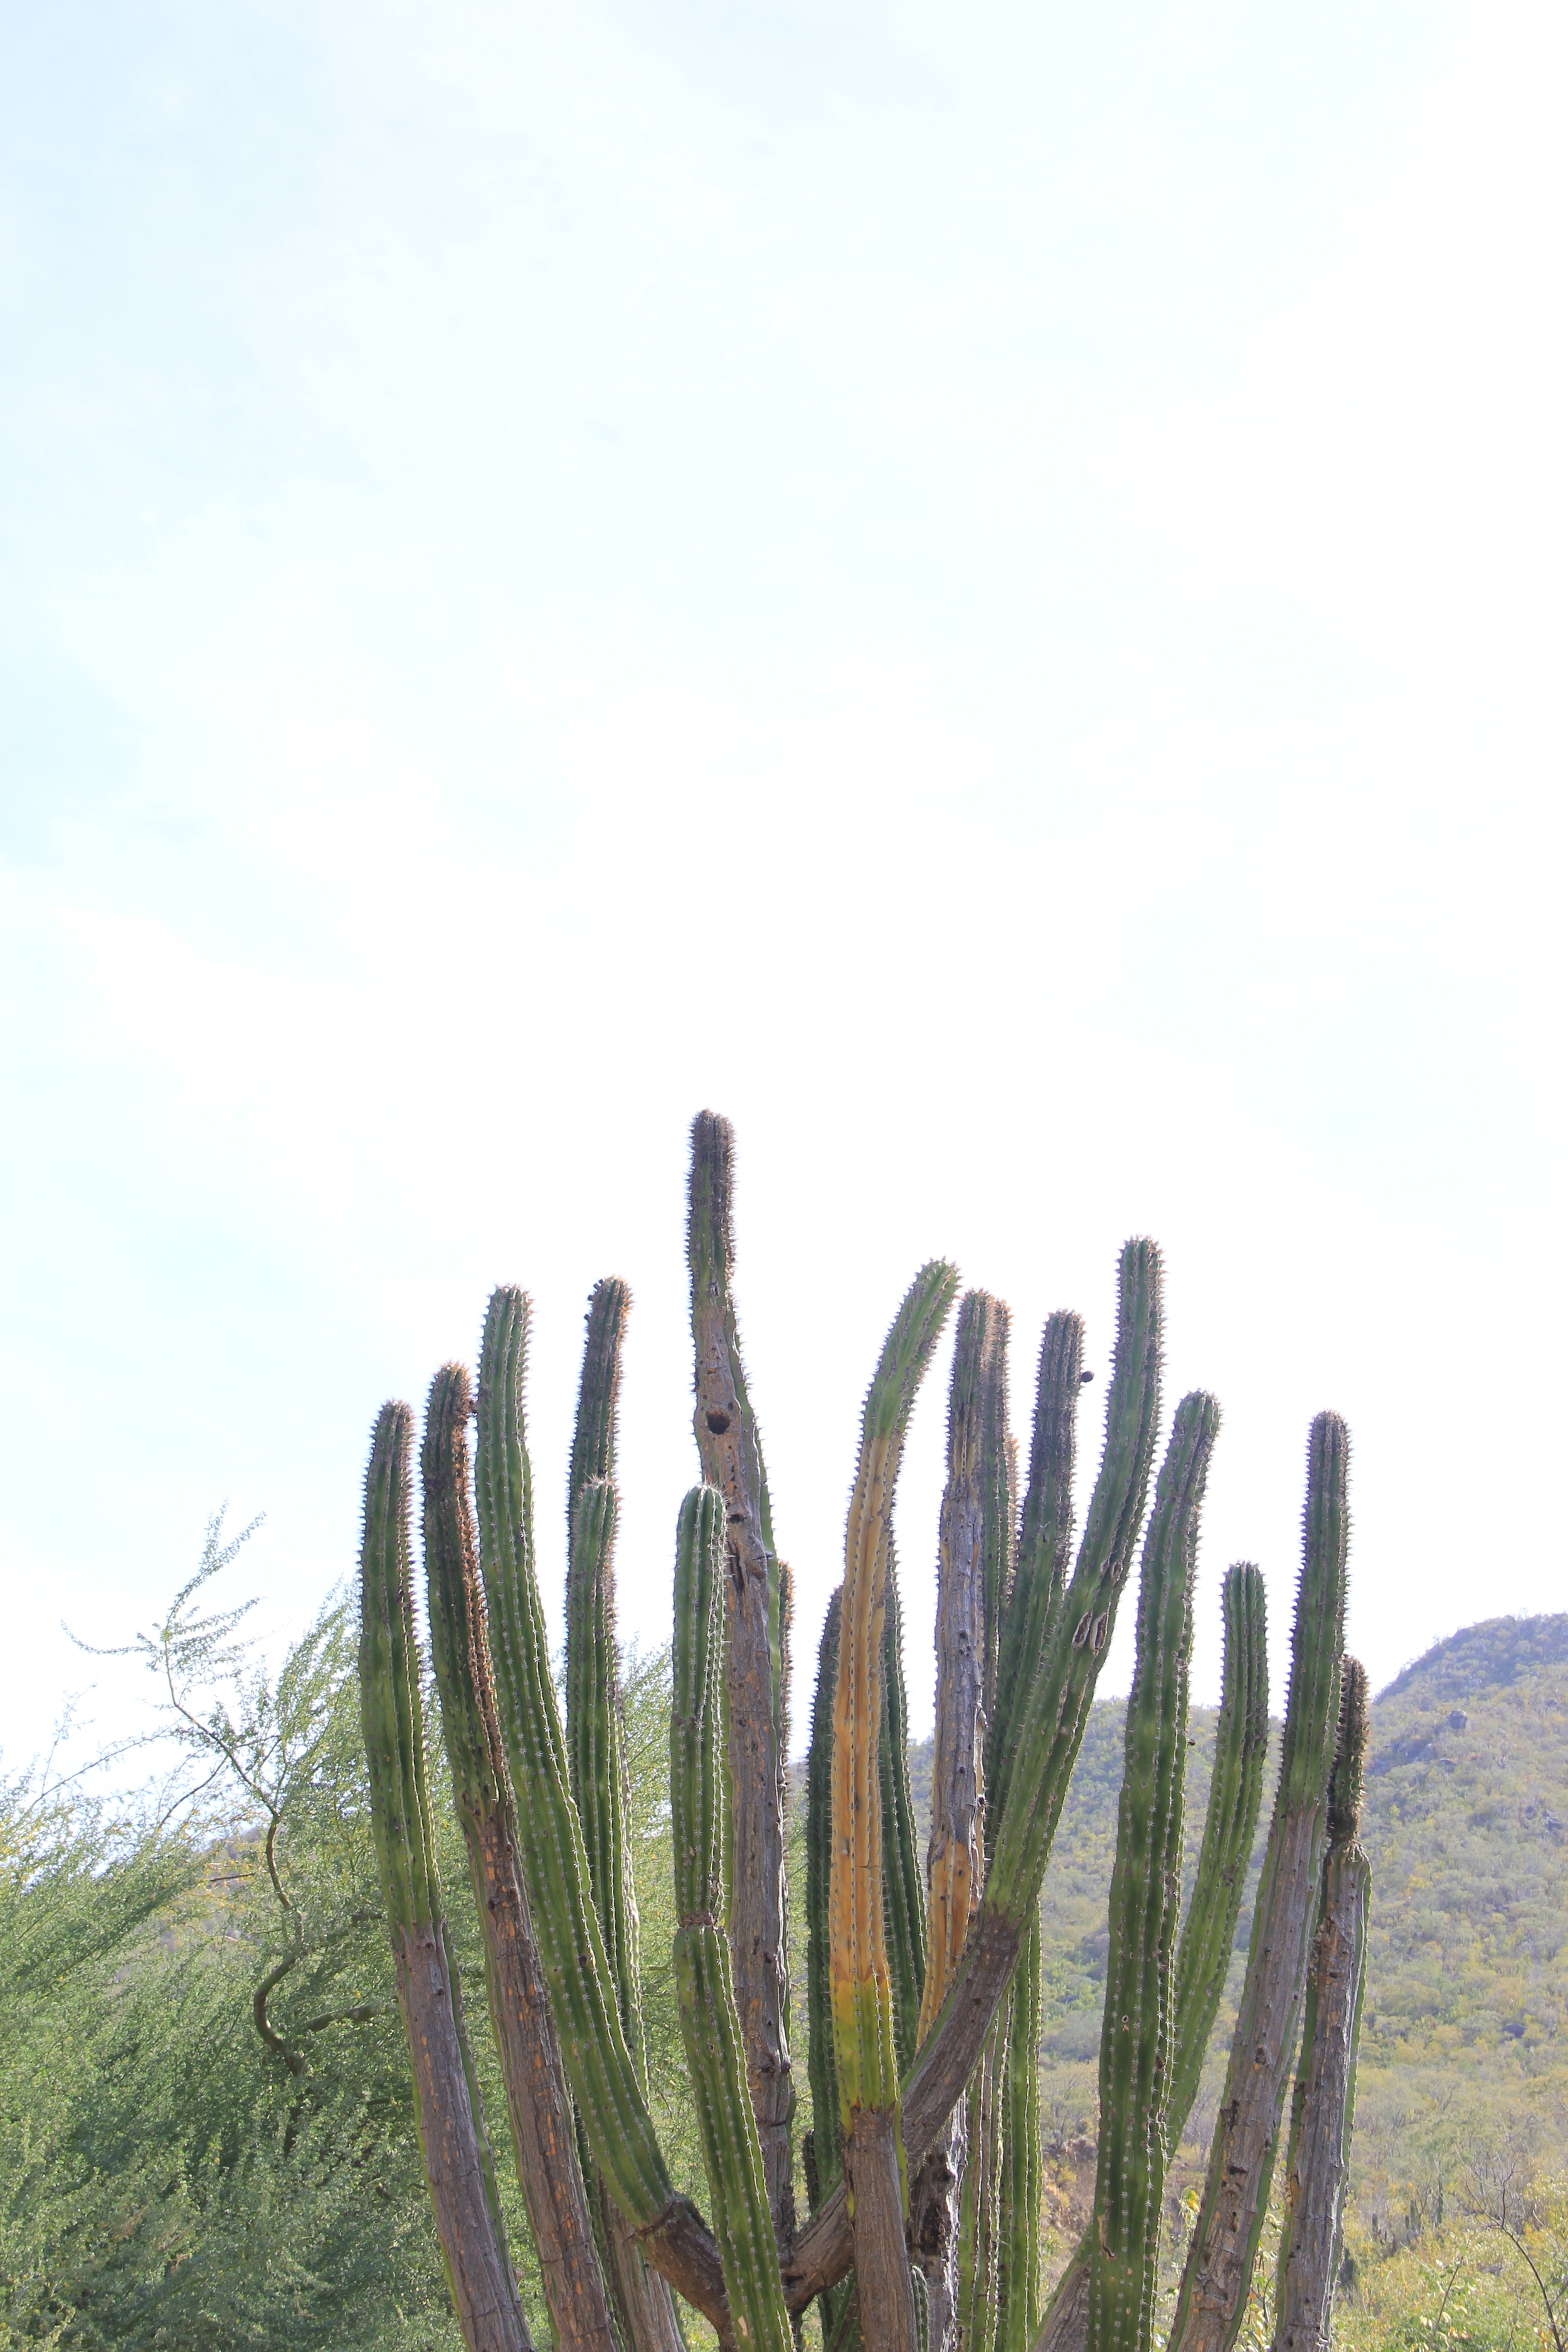 Cardon Cactus along the backroads of Baja California Sur